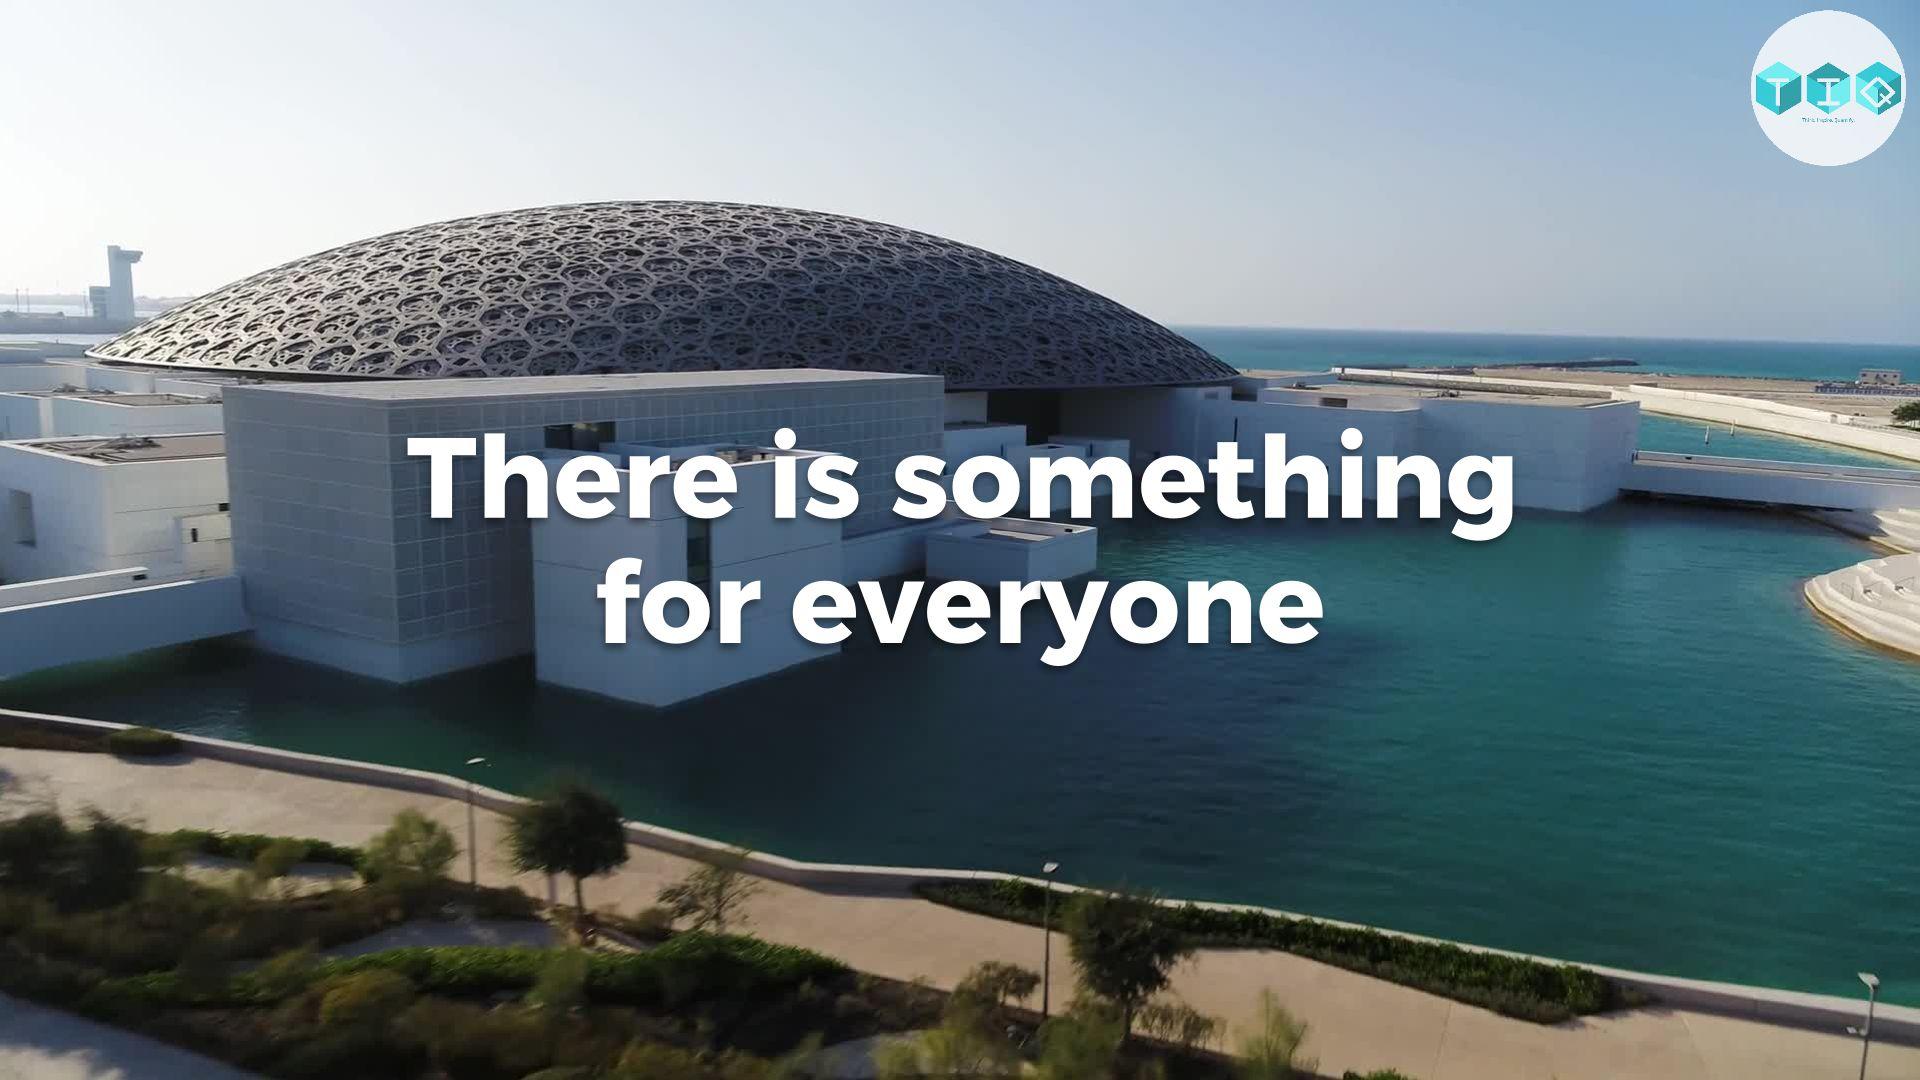 TIQ USE Expo 2020 Services